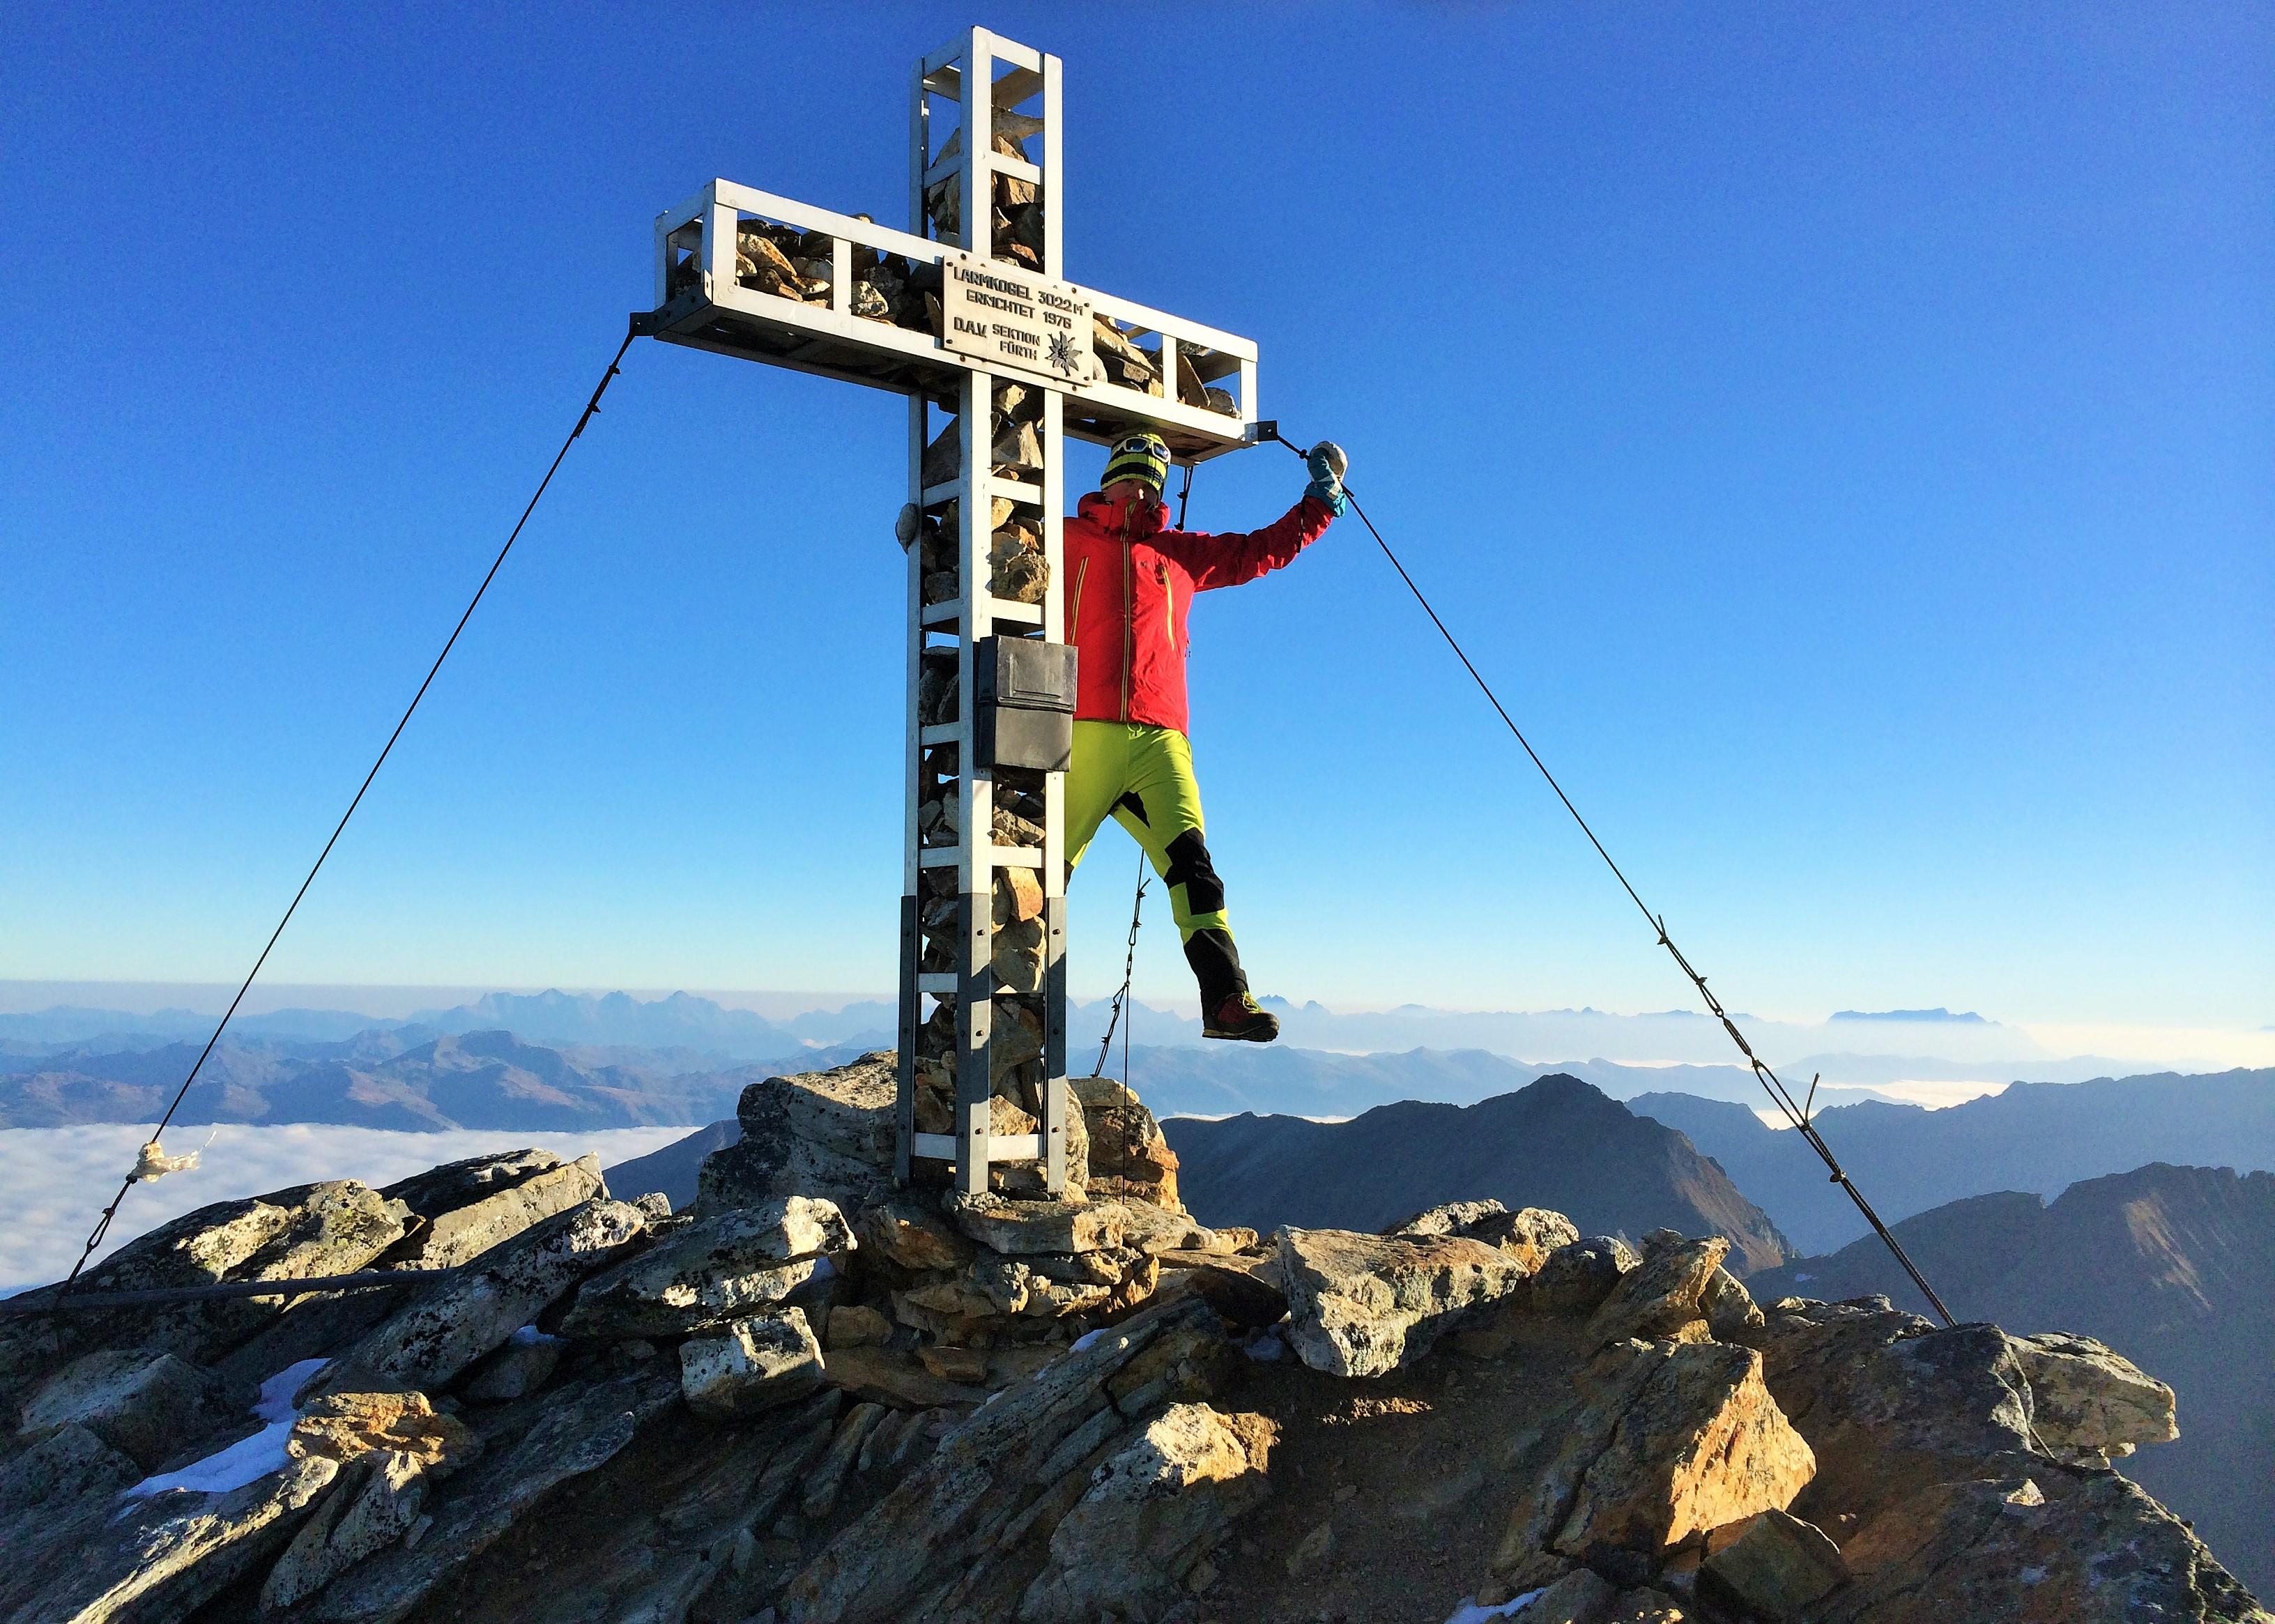 Klettereien am Gipfelkreuz